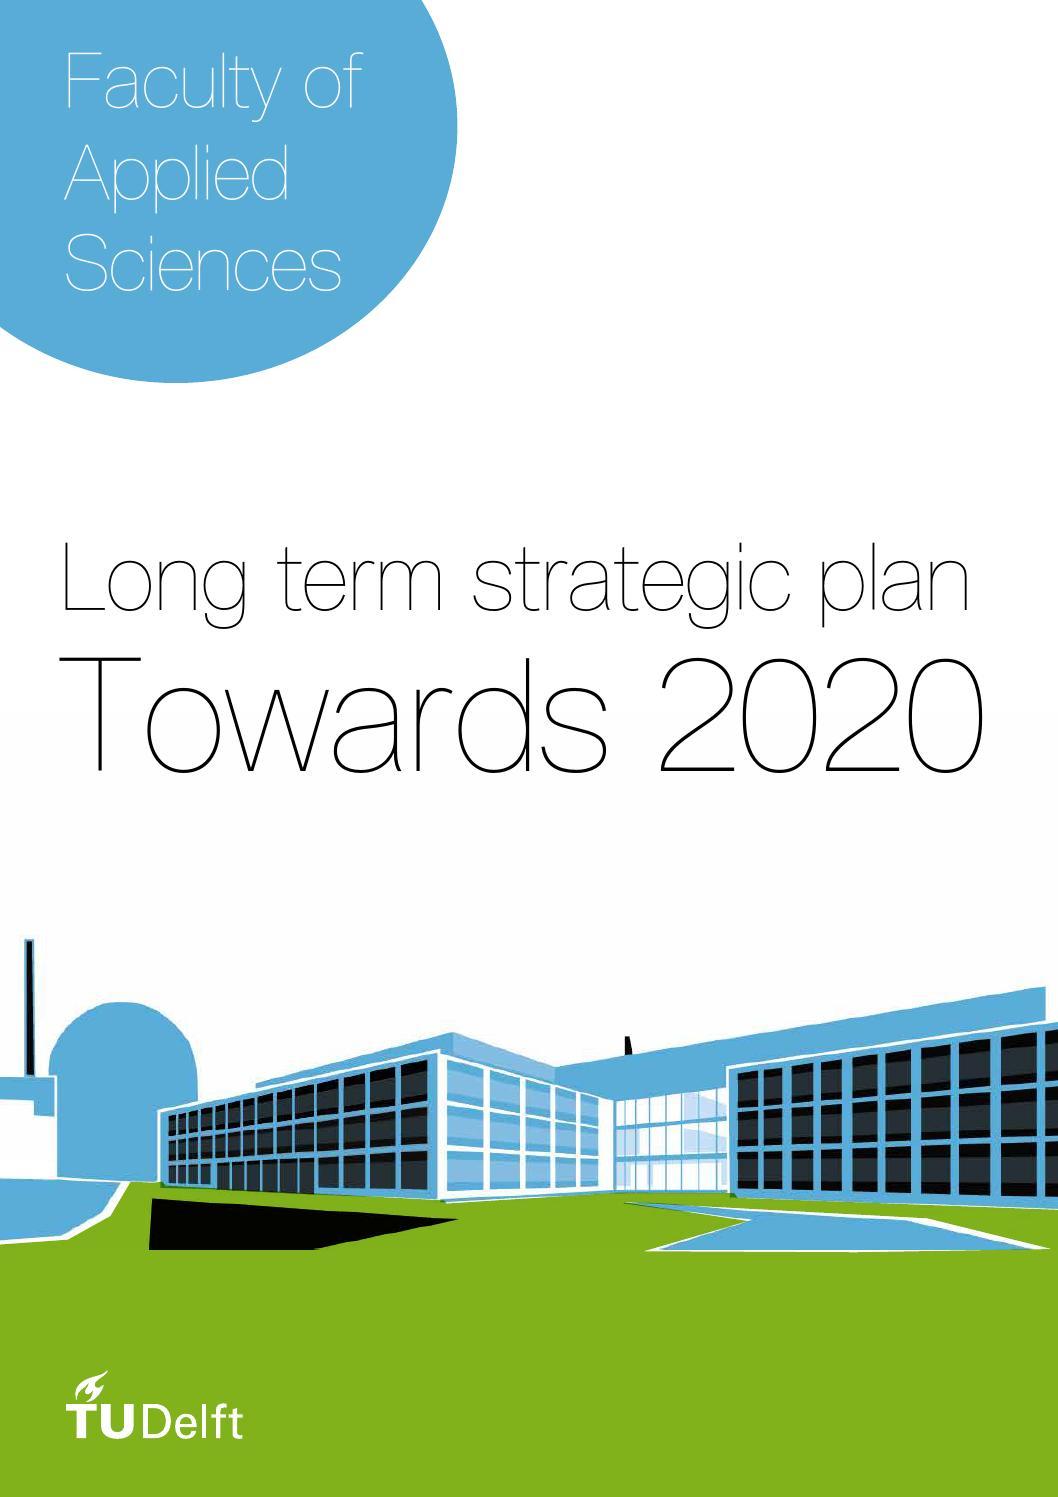 Meerjarenplan Tnwtu Delft - Issuu inside Tu Delft Time Table Boukunde 2020